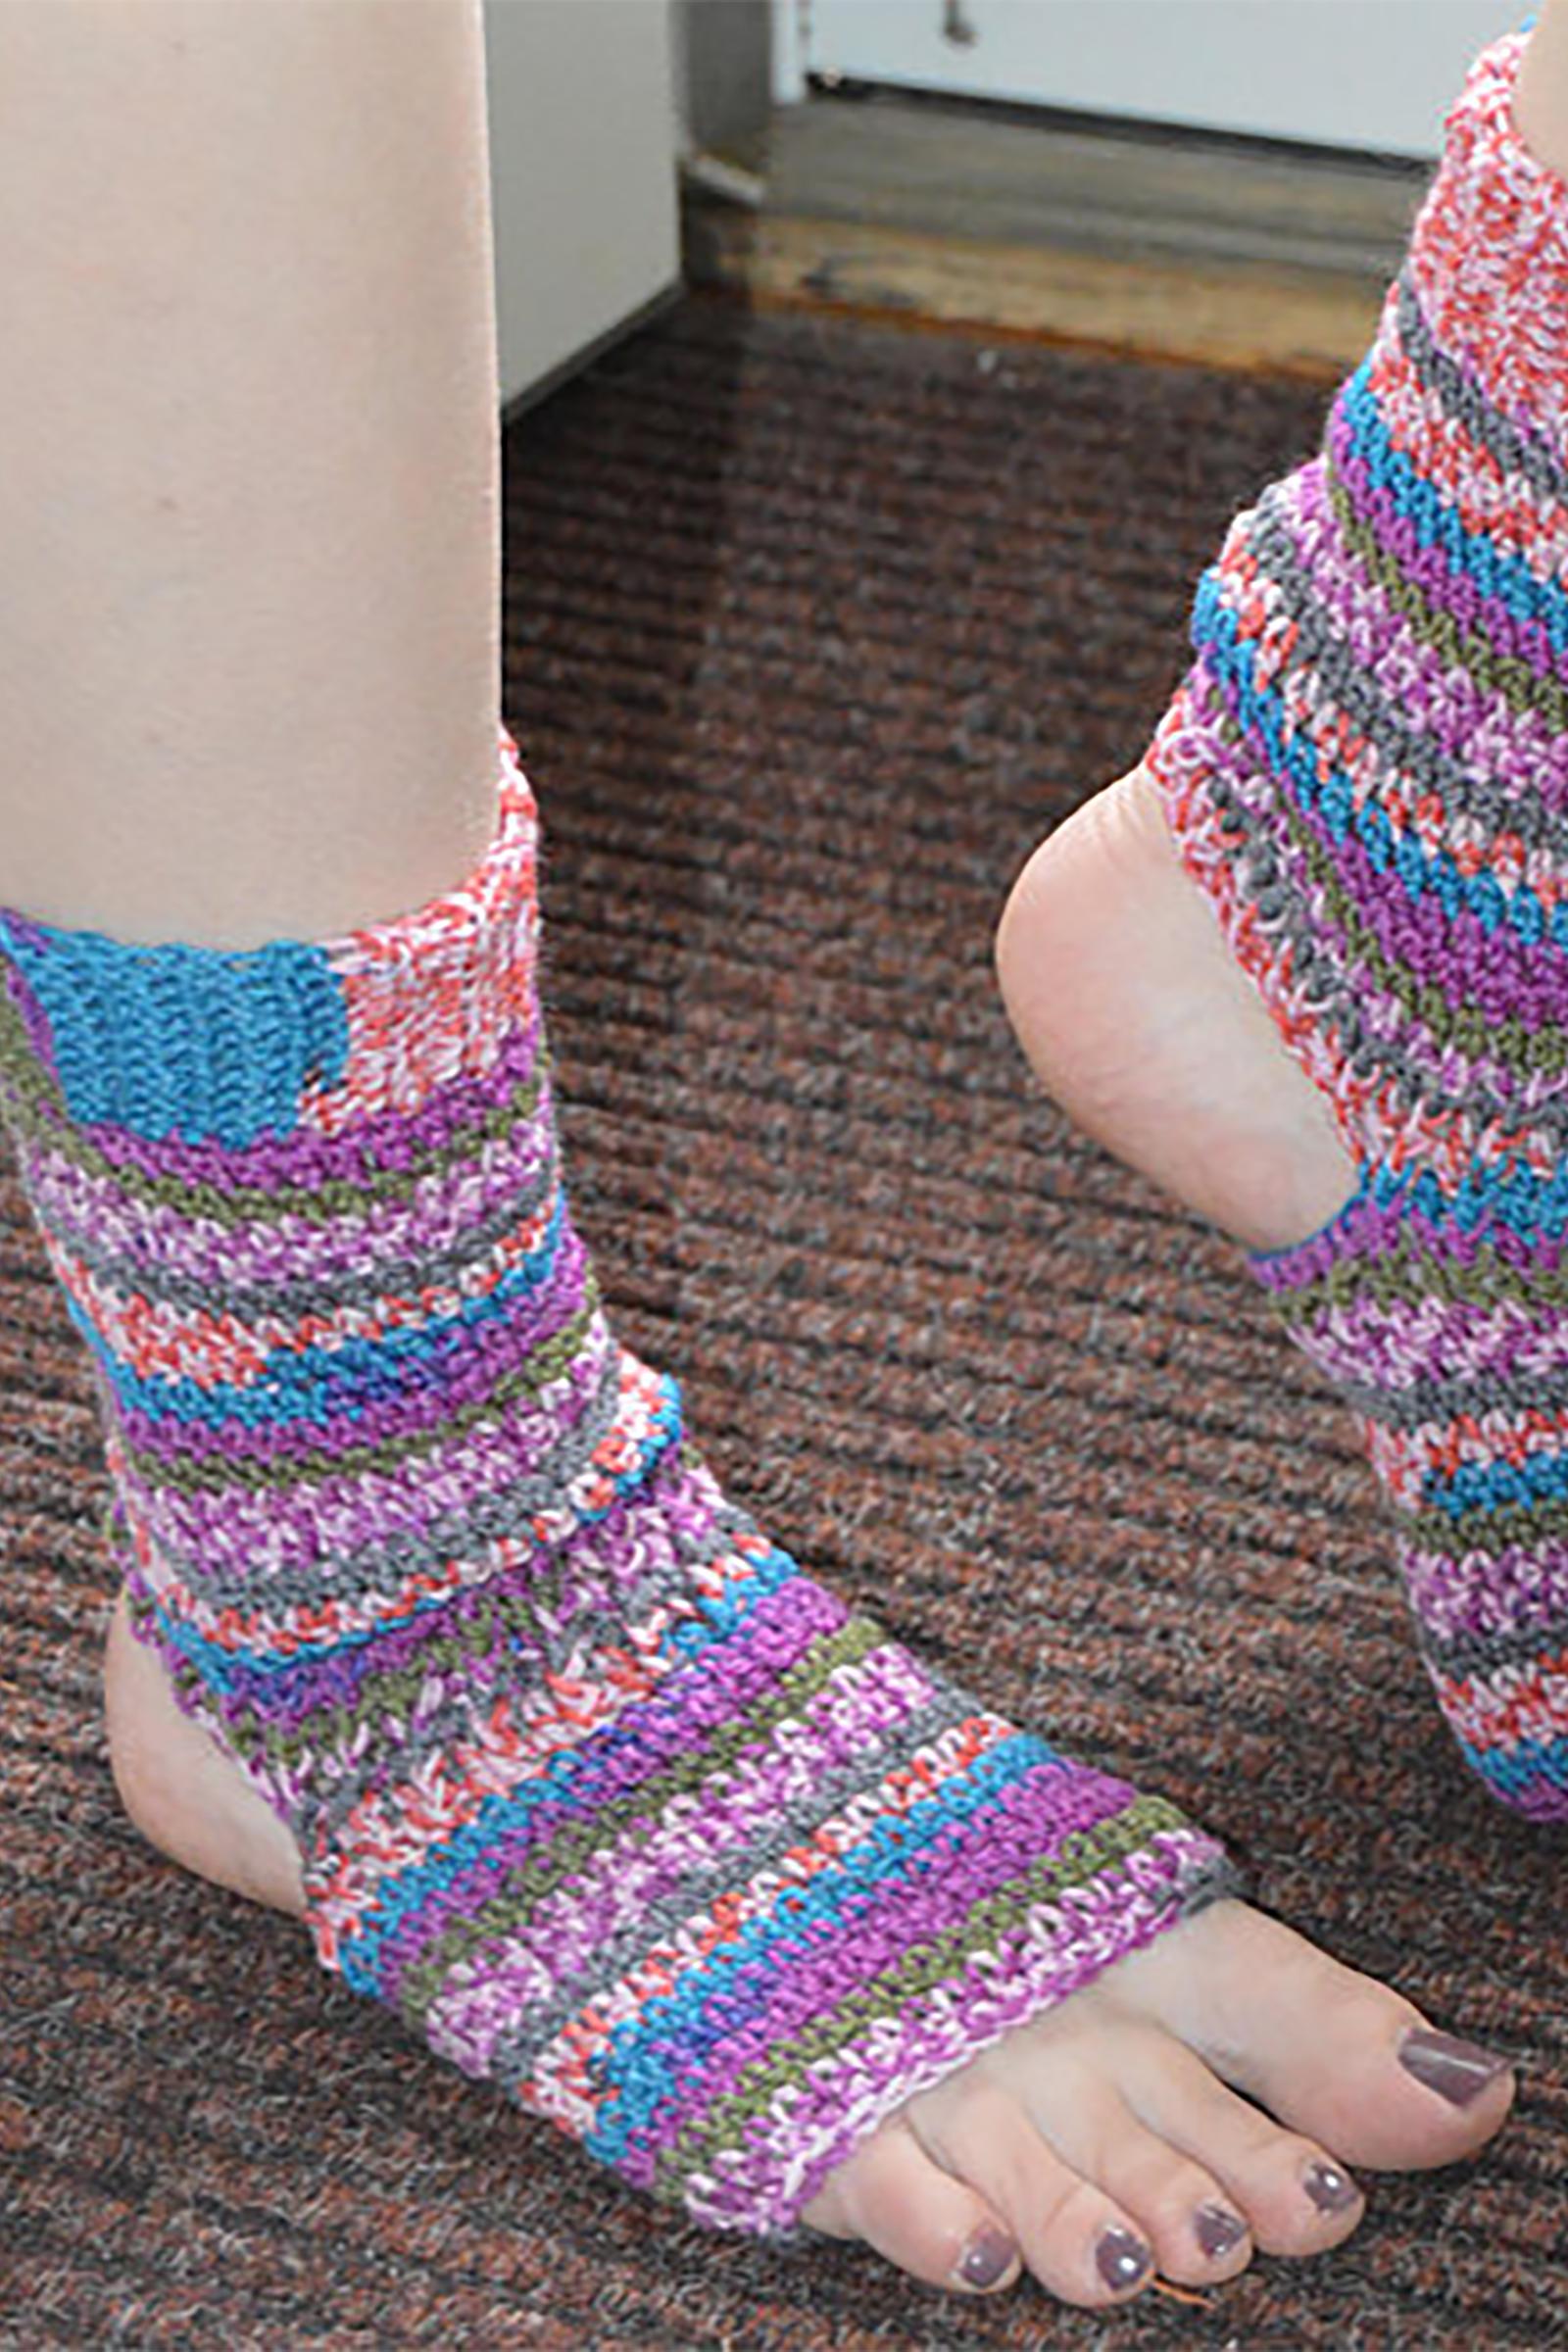 Flip Flip Socks Where To Buy Flip Flop Socks